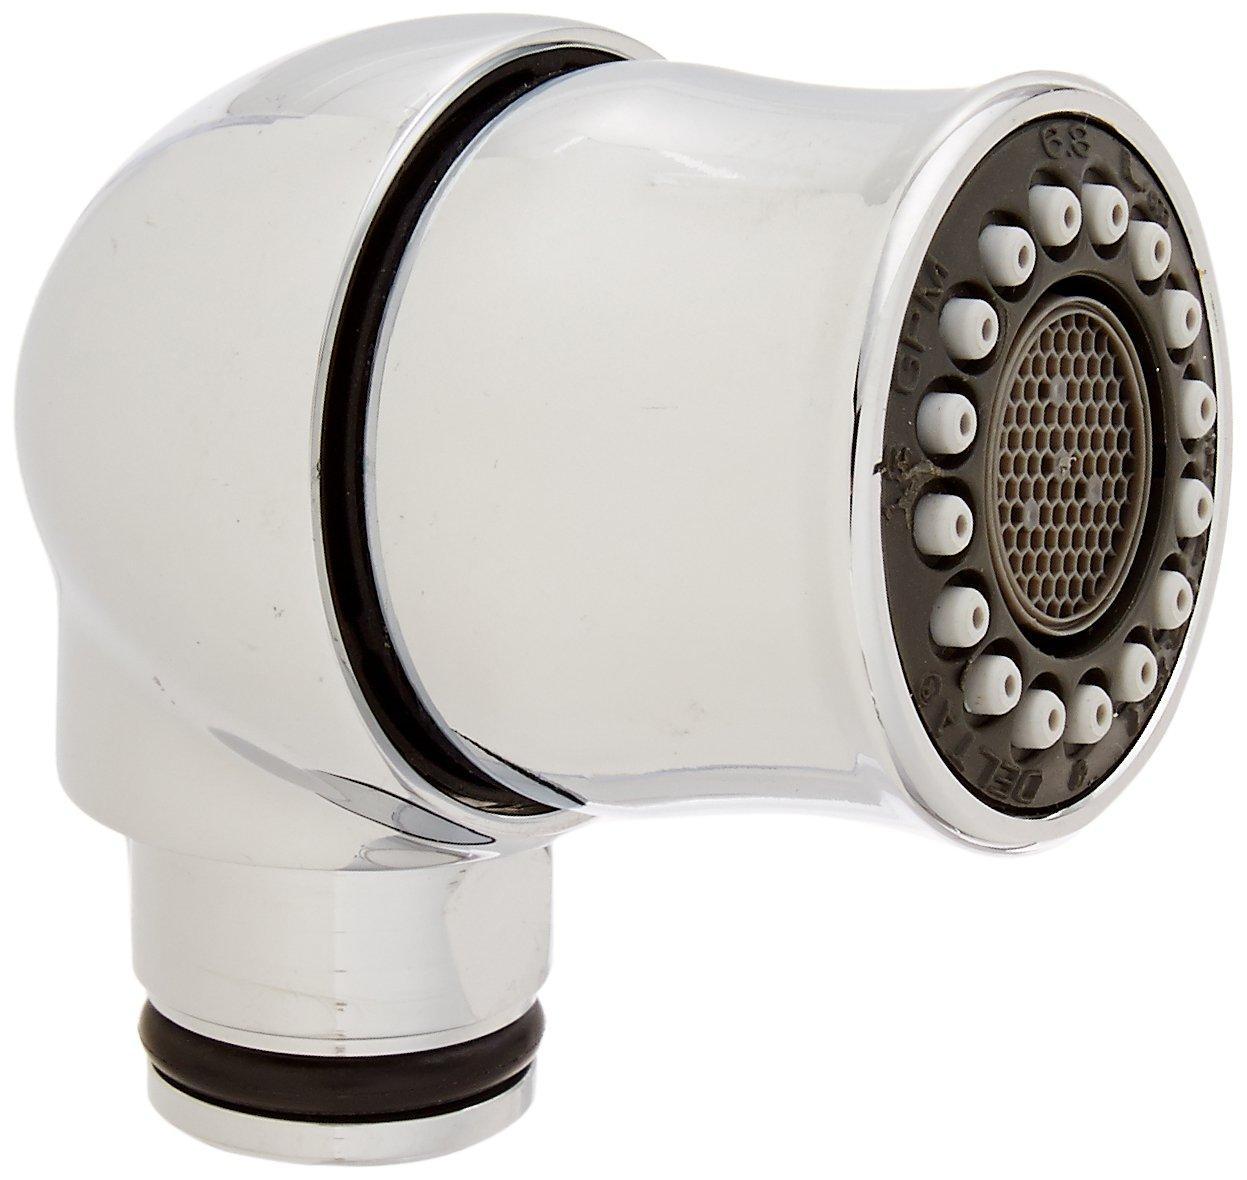 Delta Faucet RP40380 Graves Product, Aerator for Swivel for Kitchen, Chrome